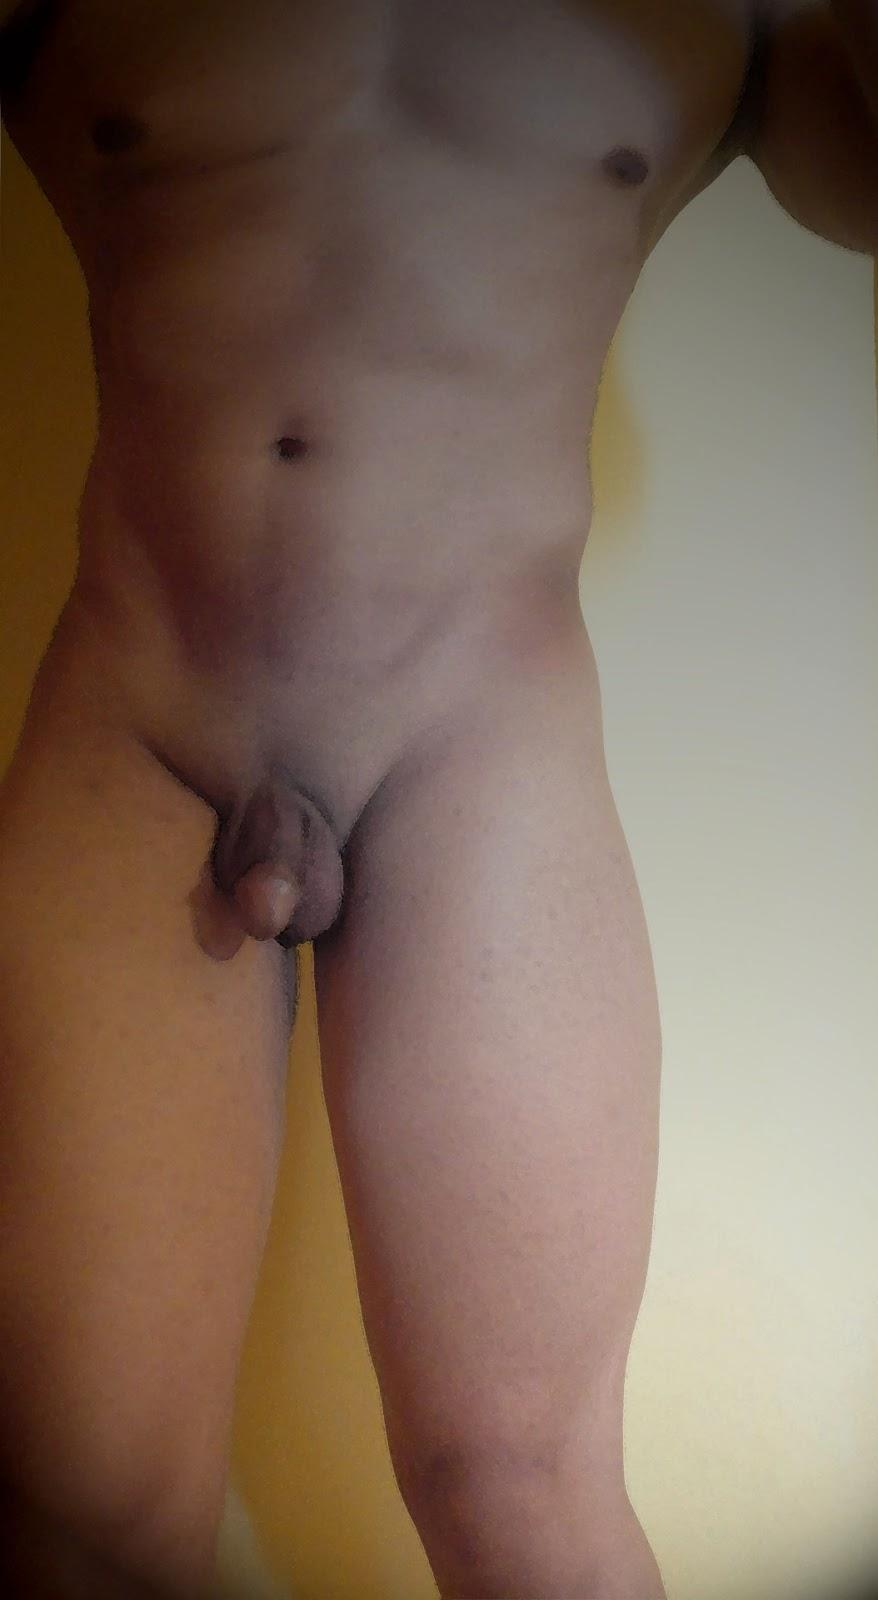 Tampa porn stars